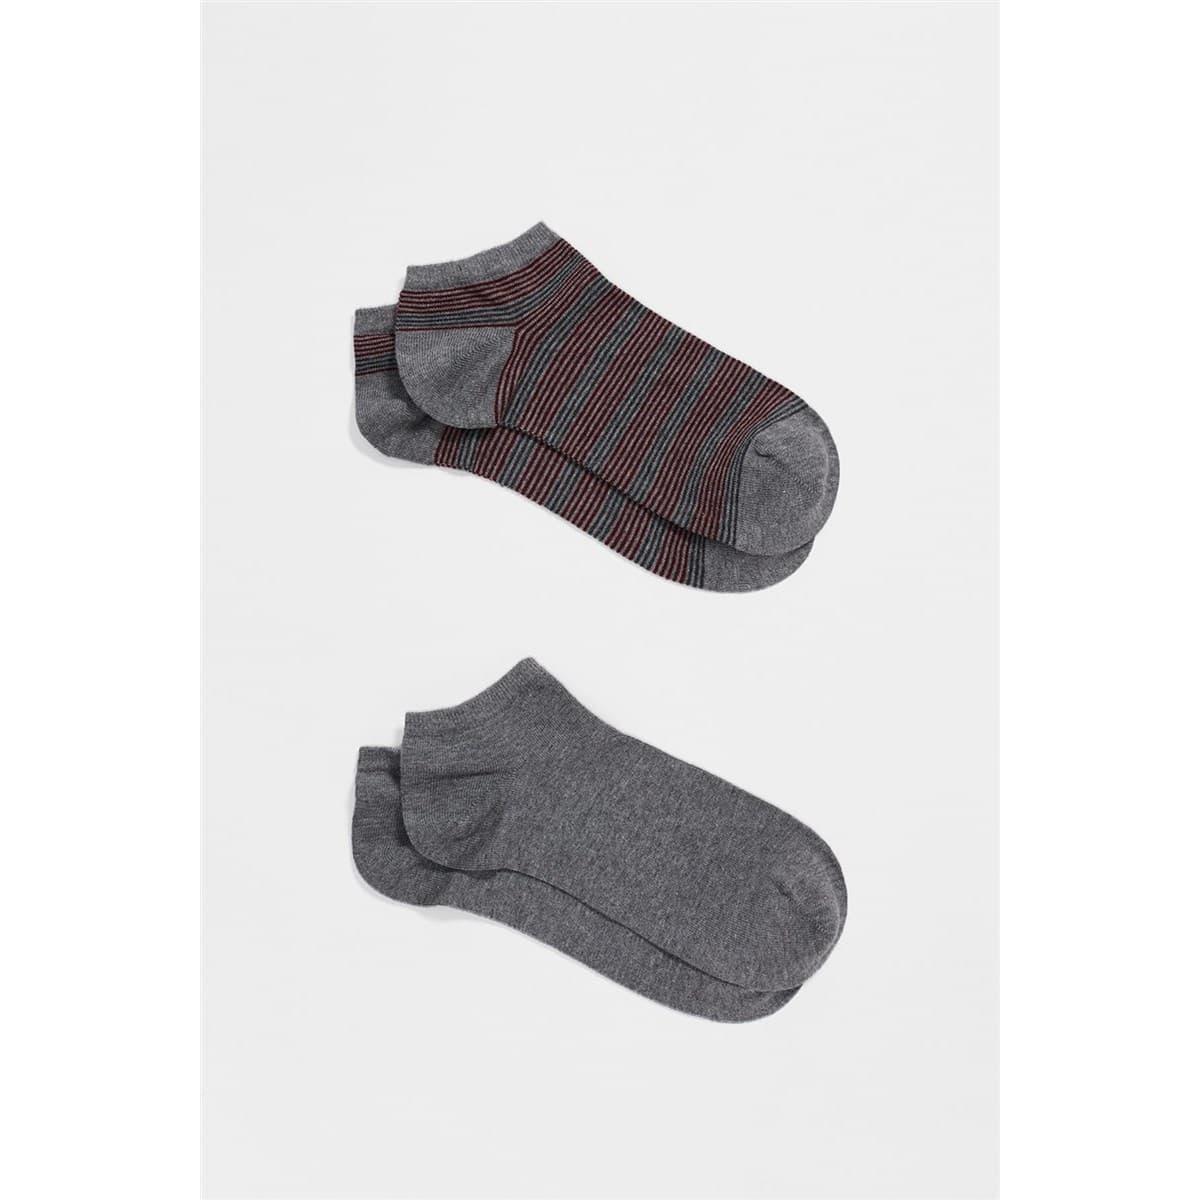 İkili Patik Çorap Gri Melanj